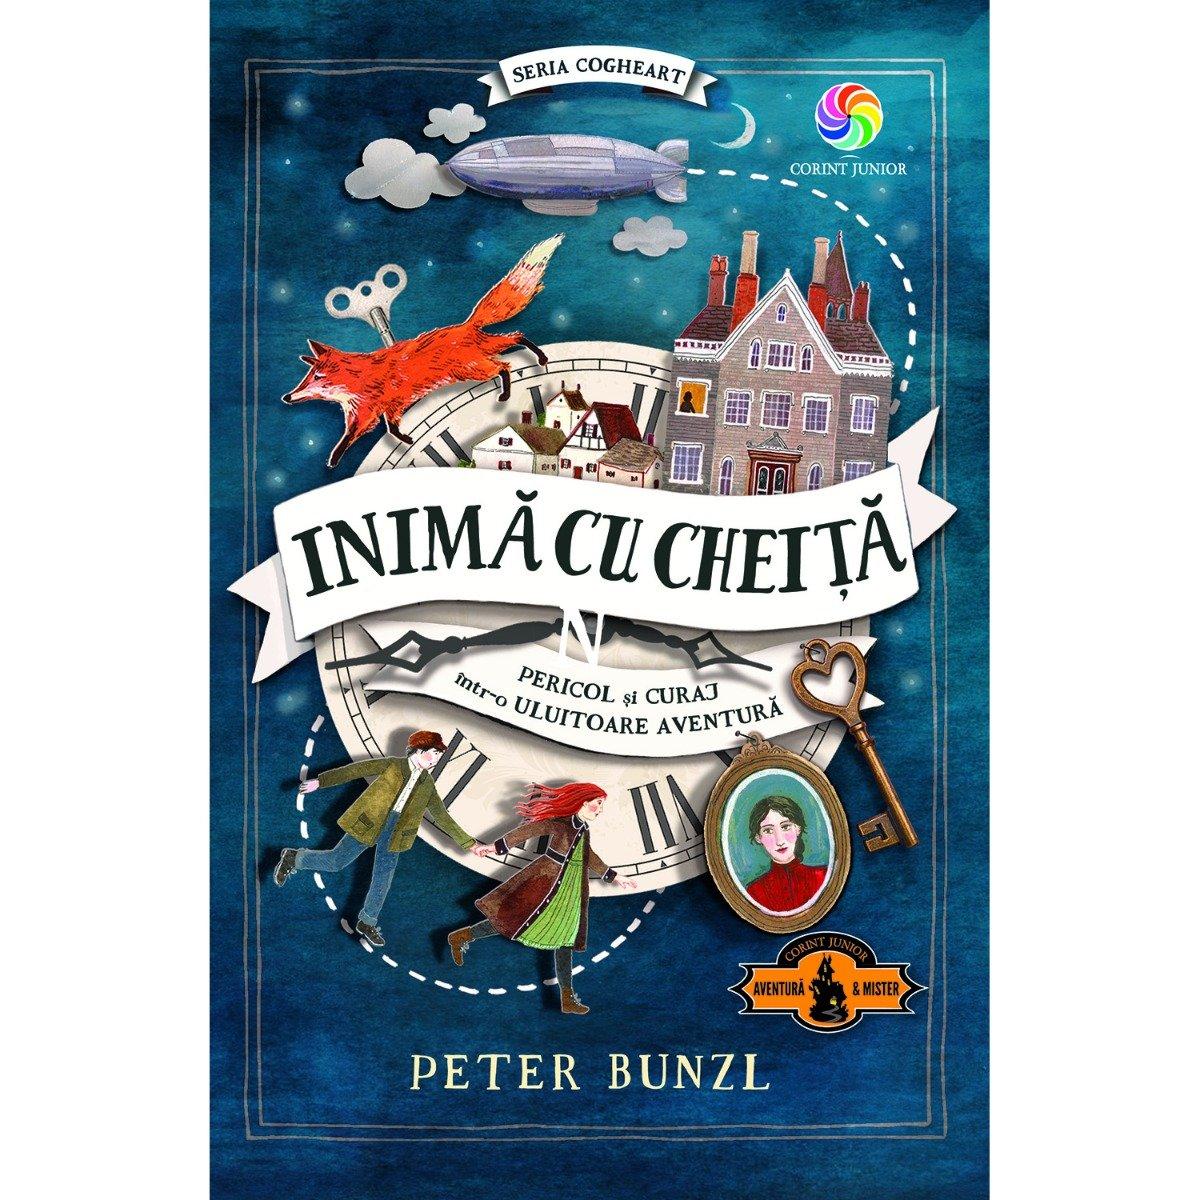 Carte Editura Corint, Cogheart vol. 1 Inima cu cheita, Peter Bunzl imagine 2021